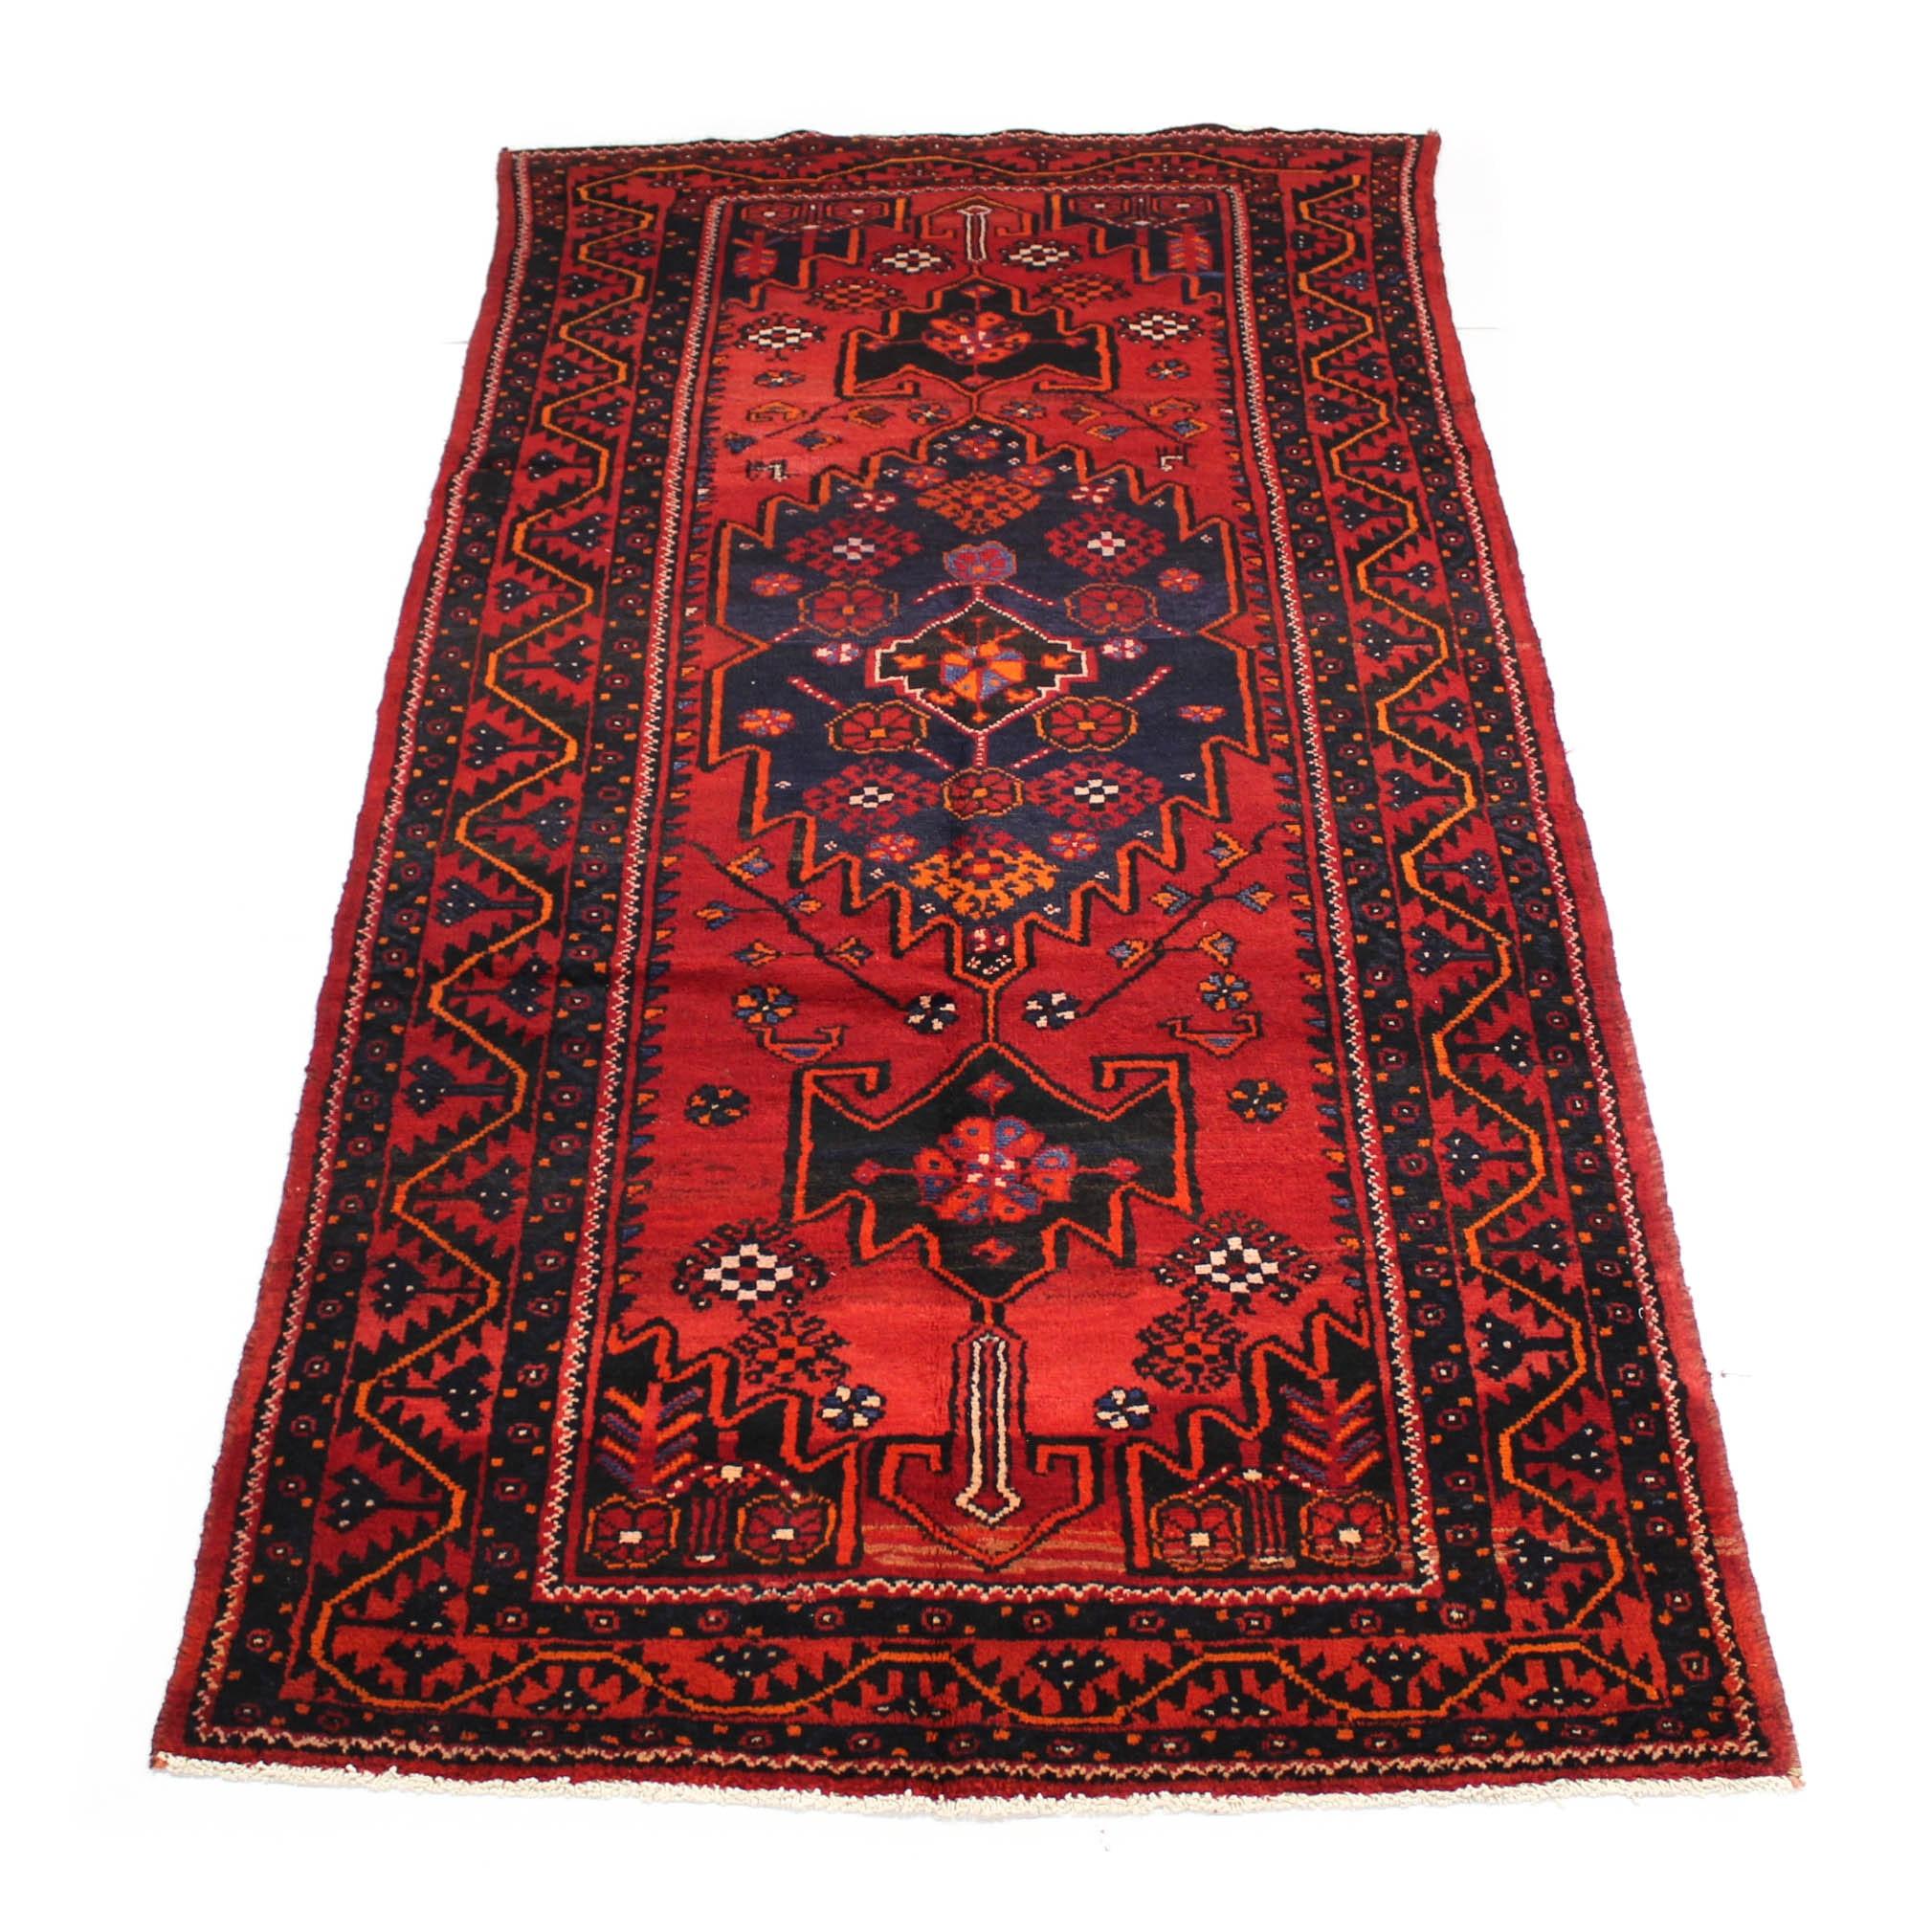 4'5 x 9'2 Semi-Antique Hand-Knotted Persian Zanjan Carpet Runner